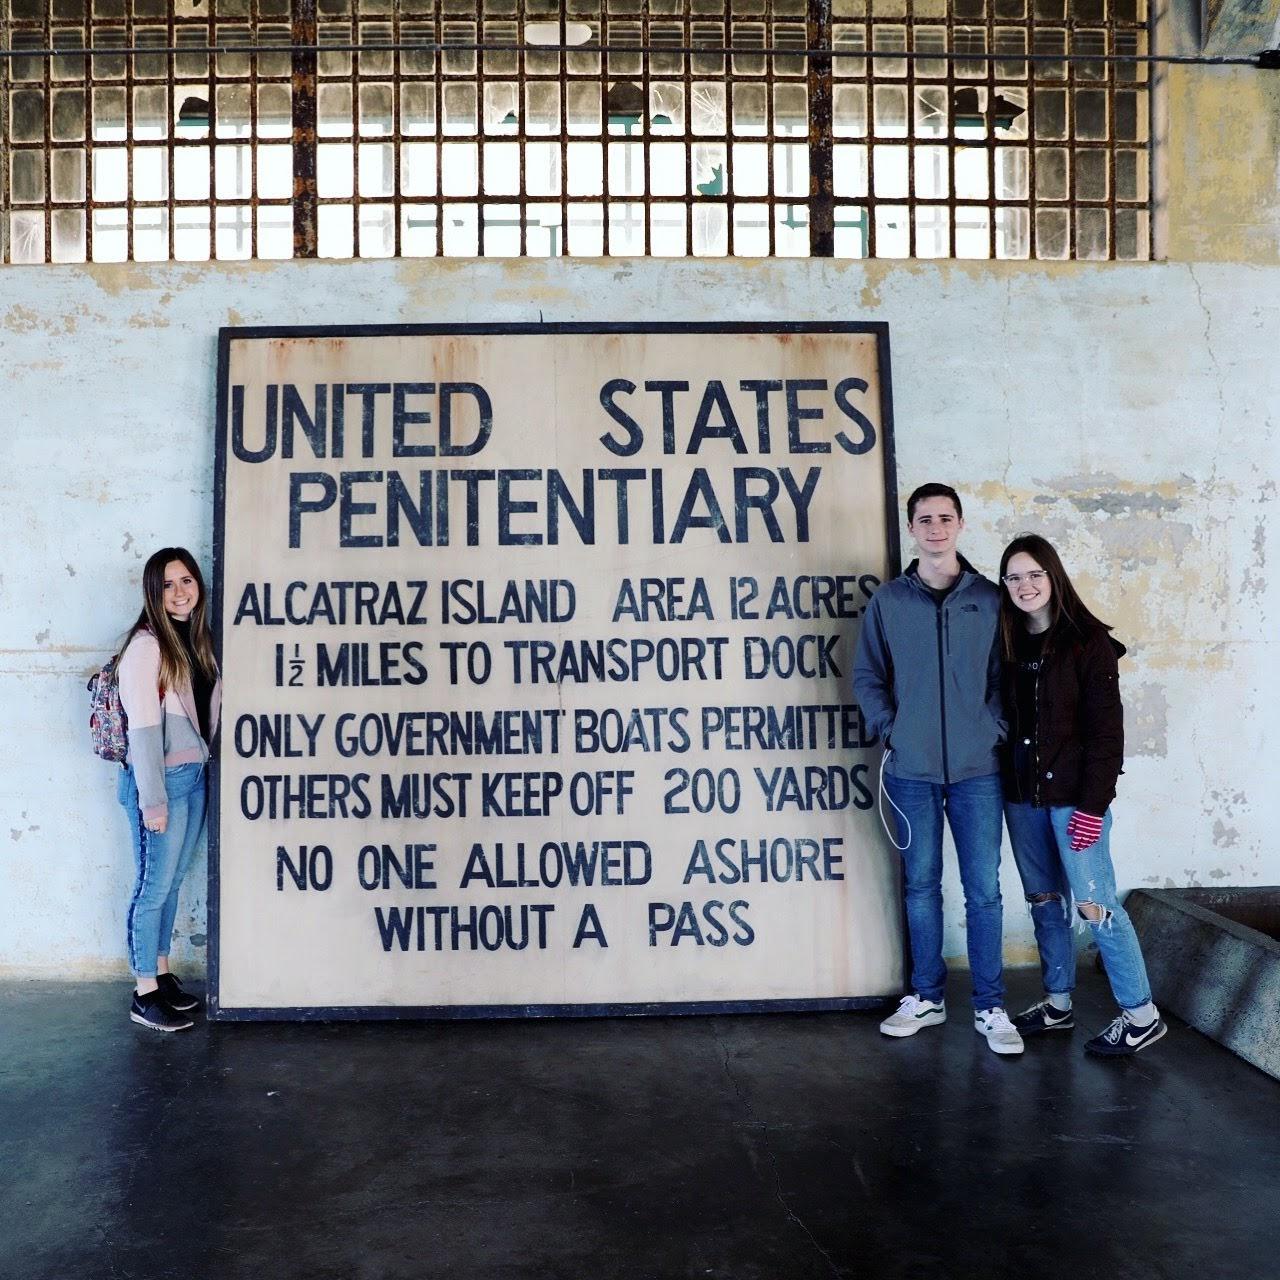 SF_alcatraz.JPG